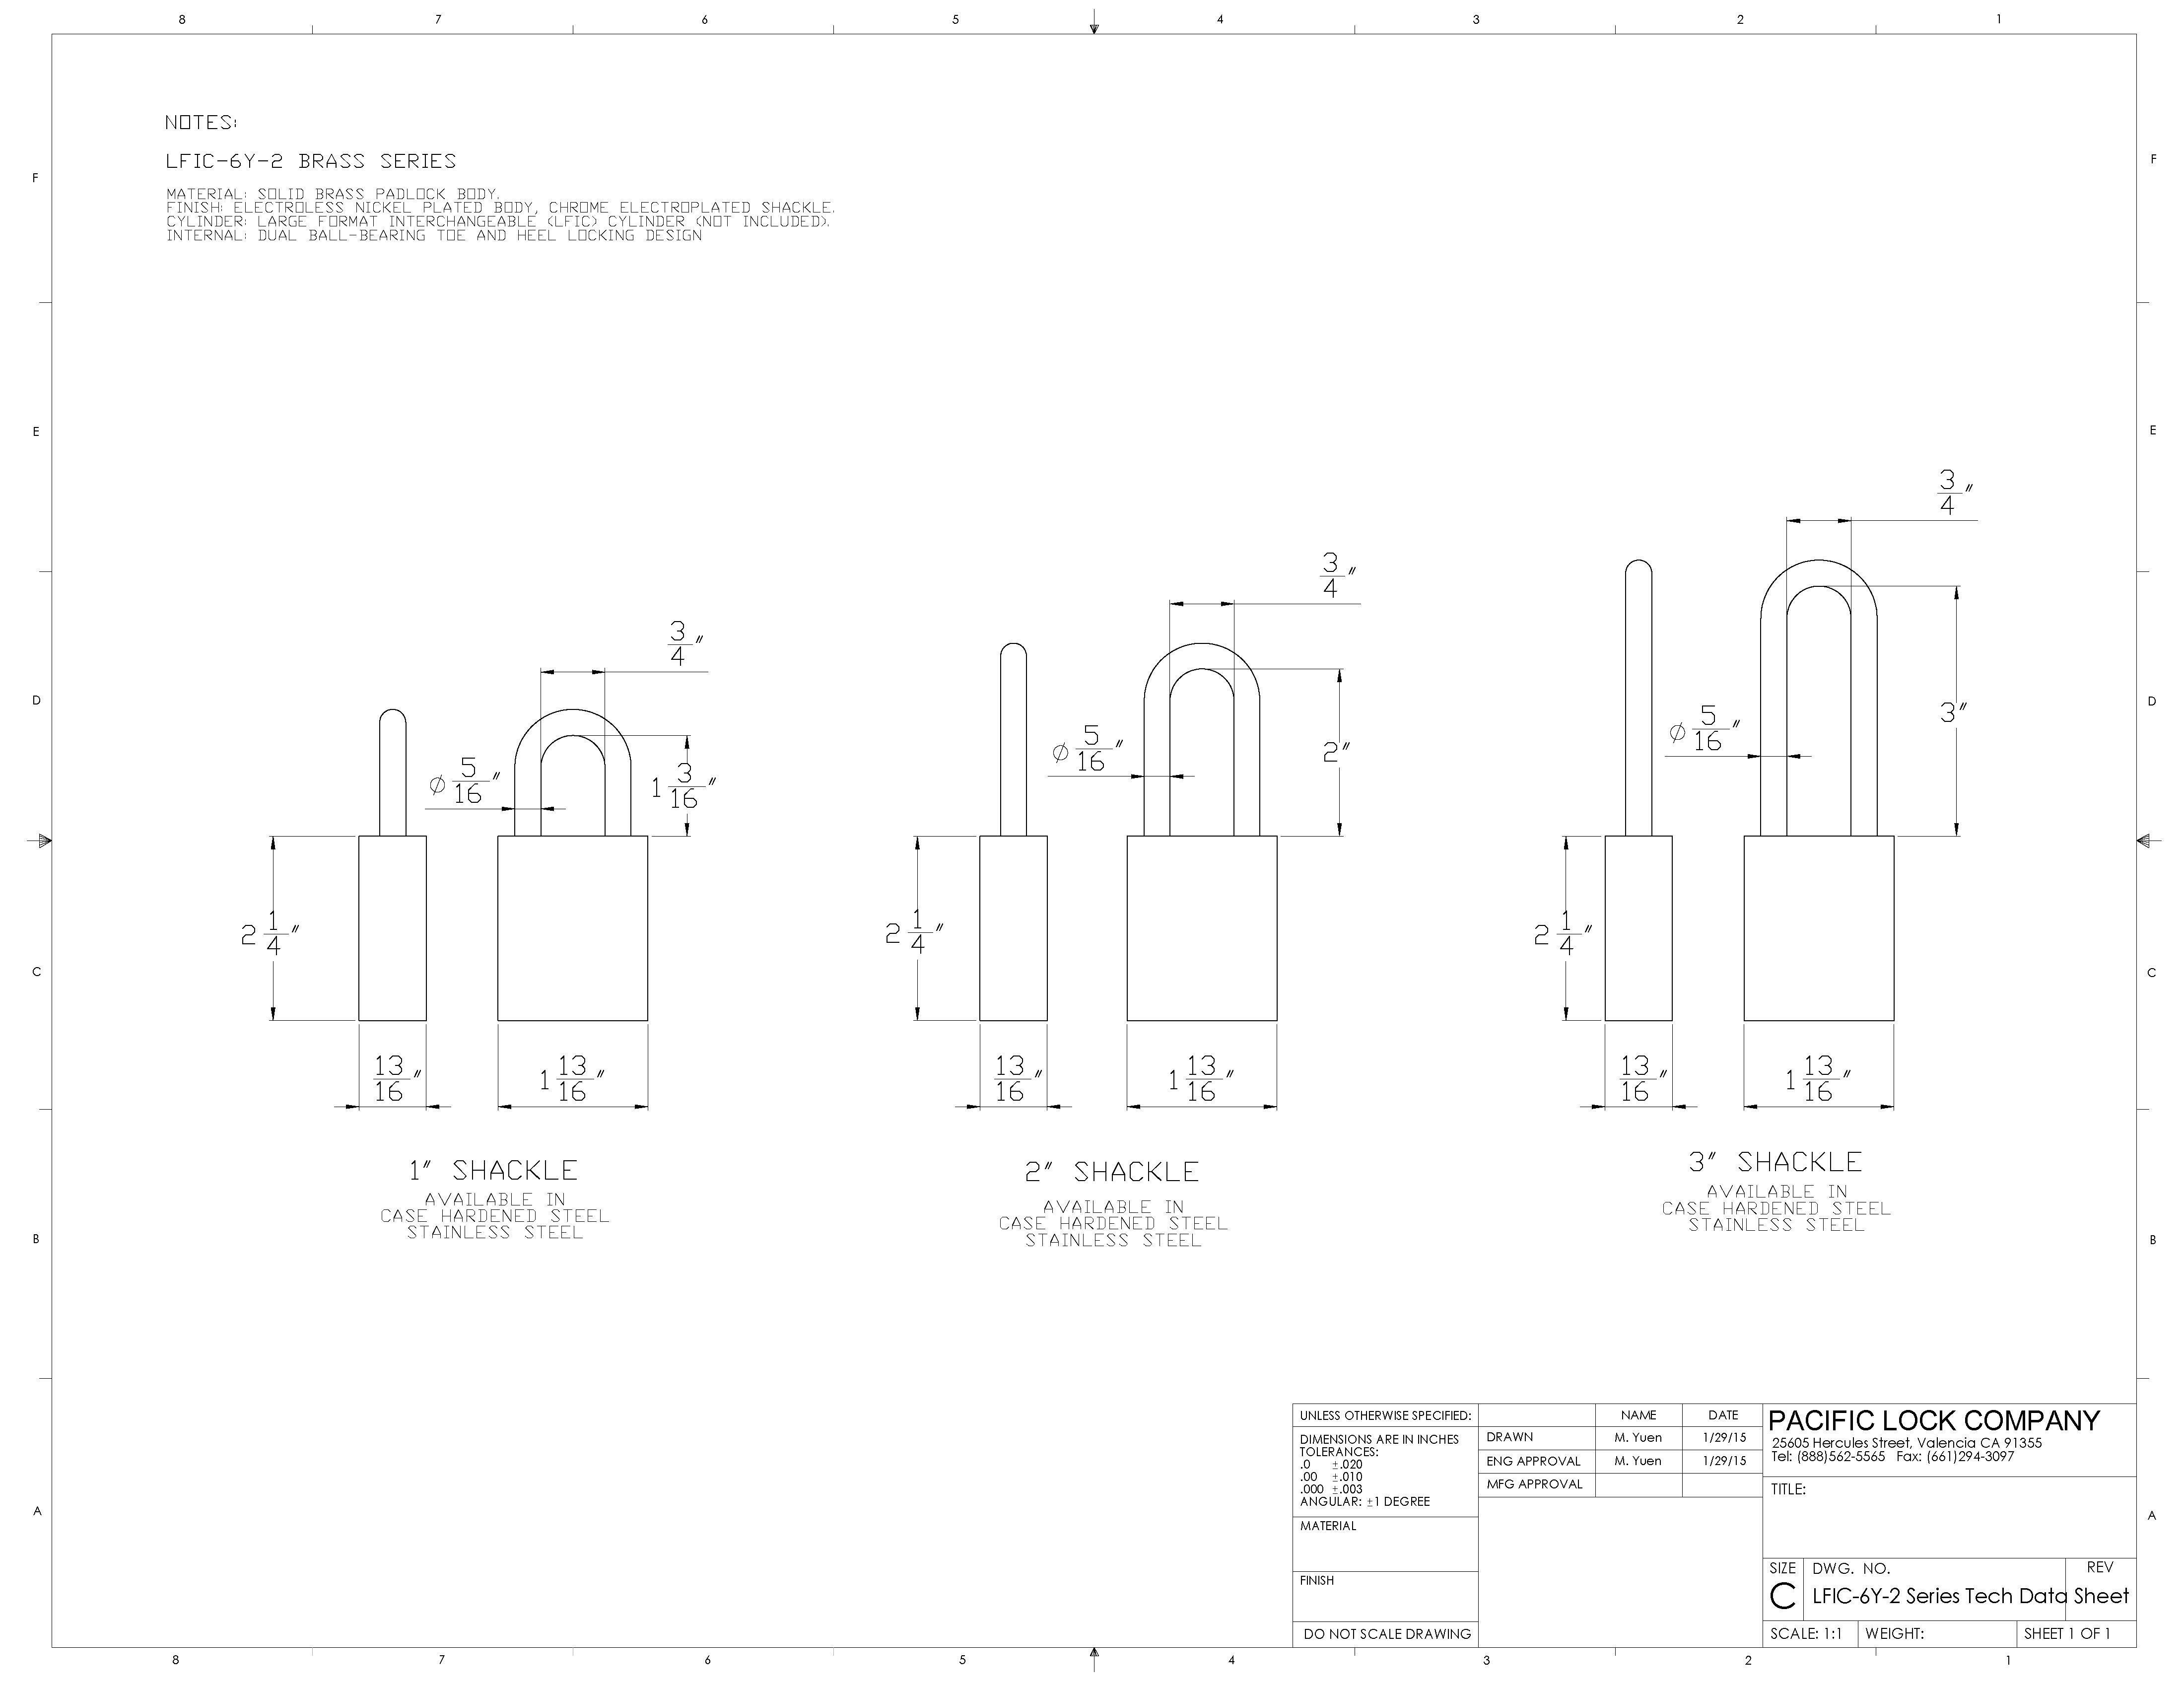 PACLOCK LFIC-Y6-2 Series Data Sheet